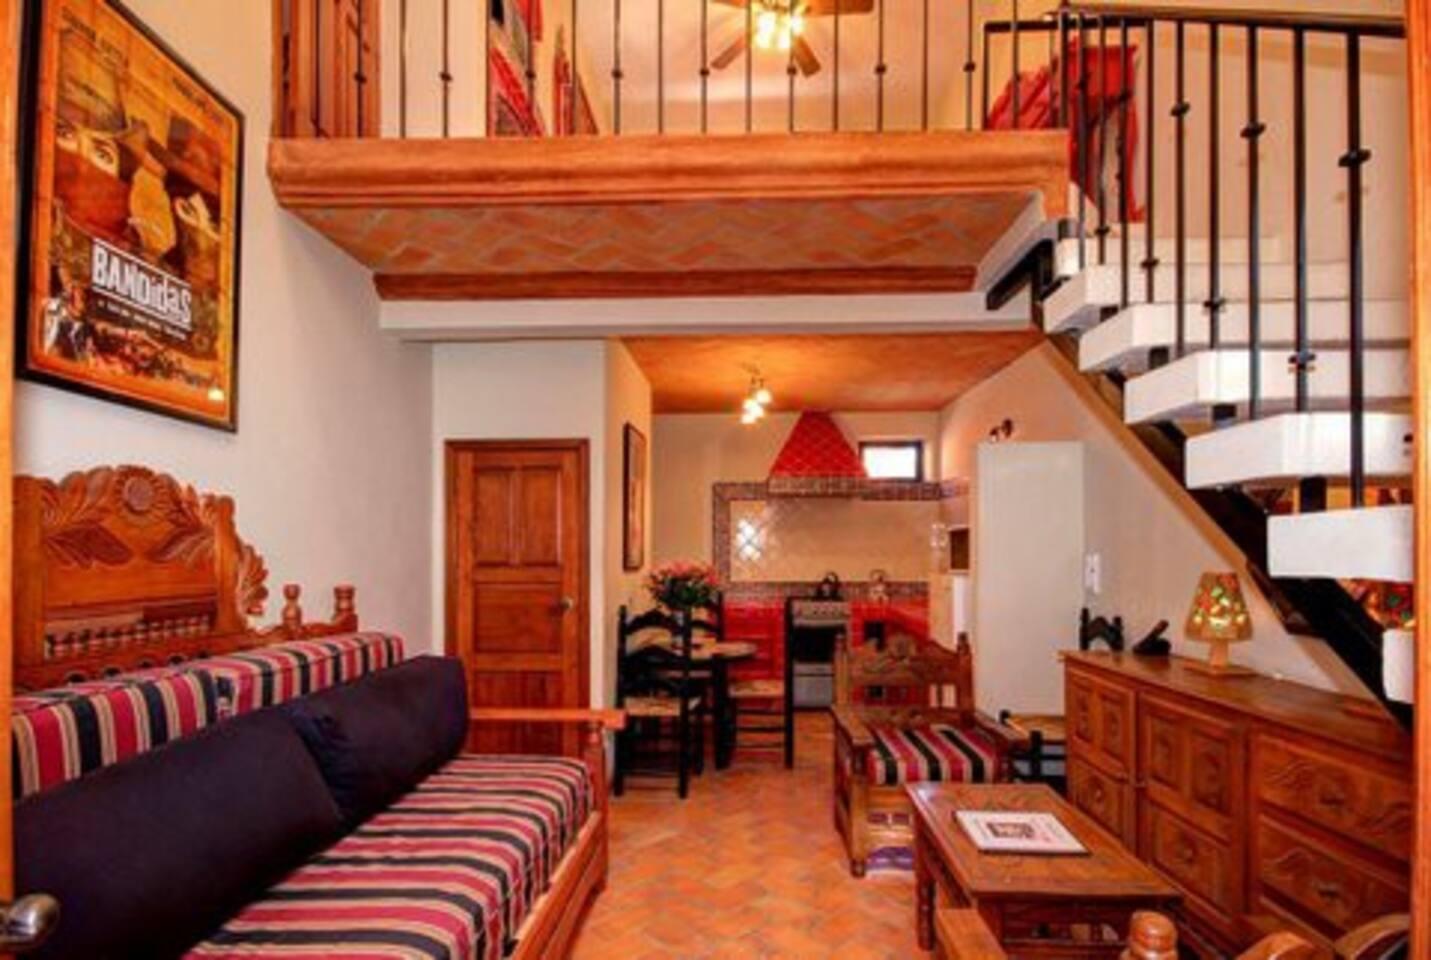 The Salma Hayek One Bedroom Loft - main level view